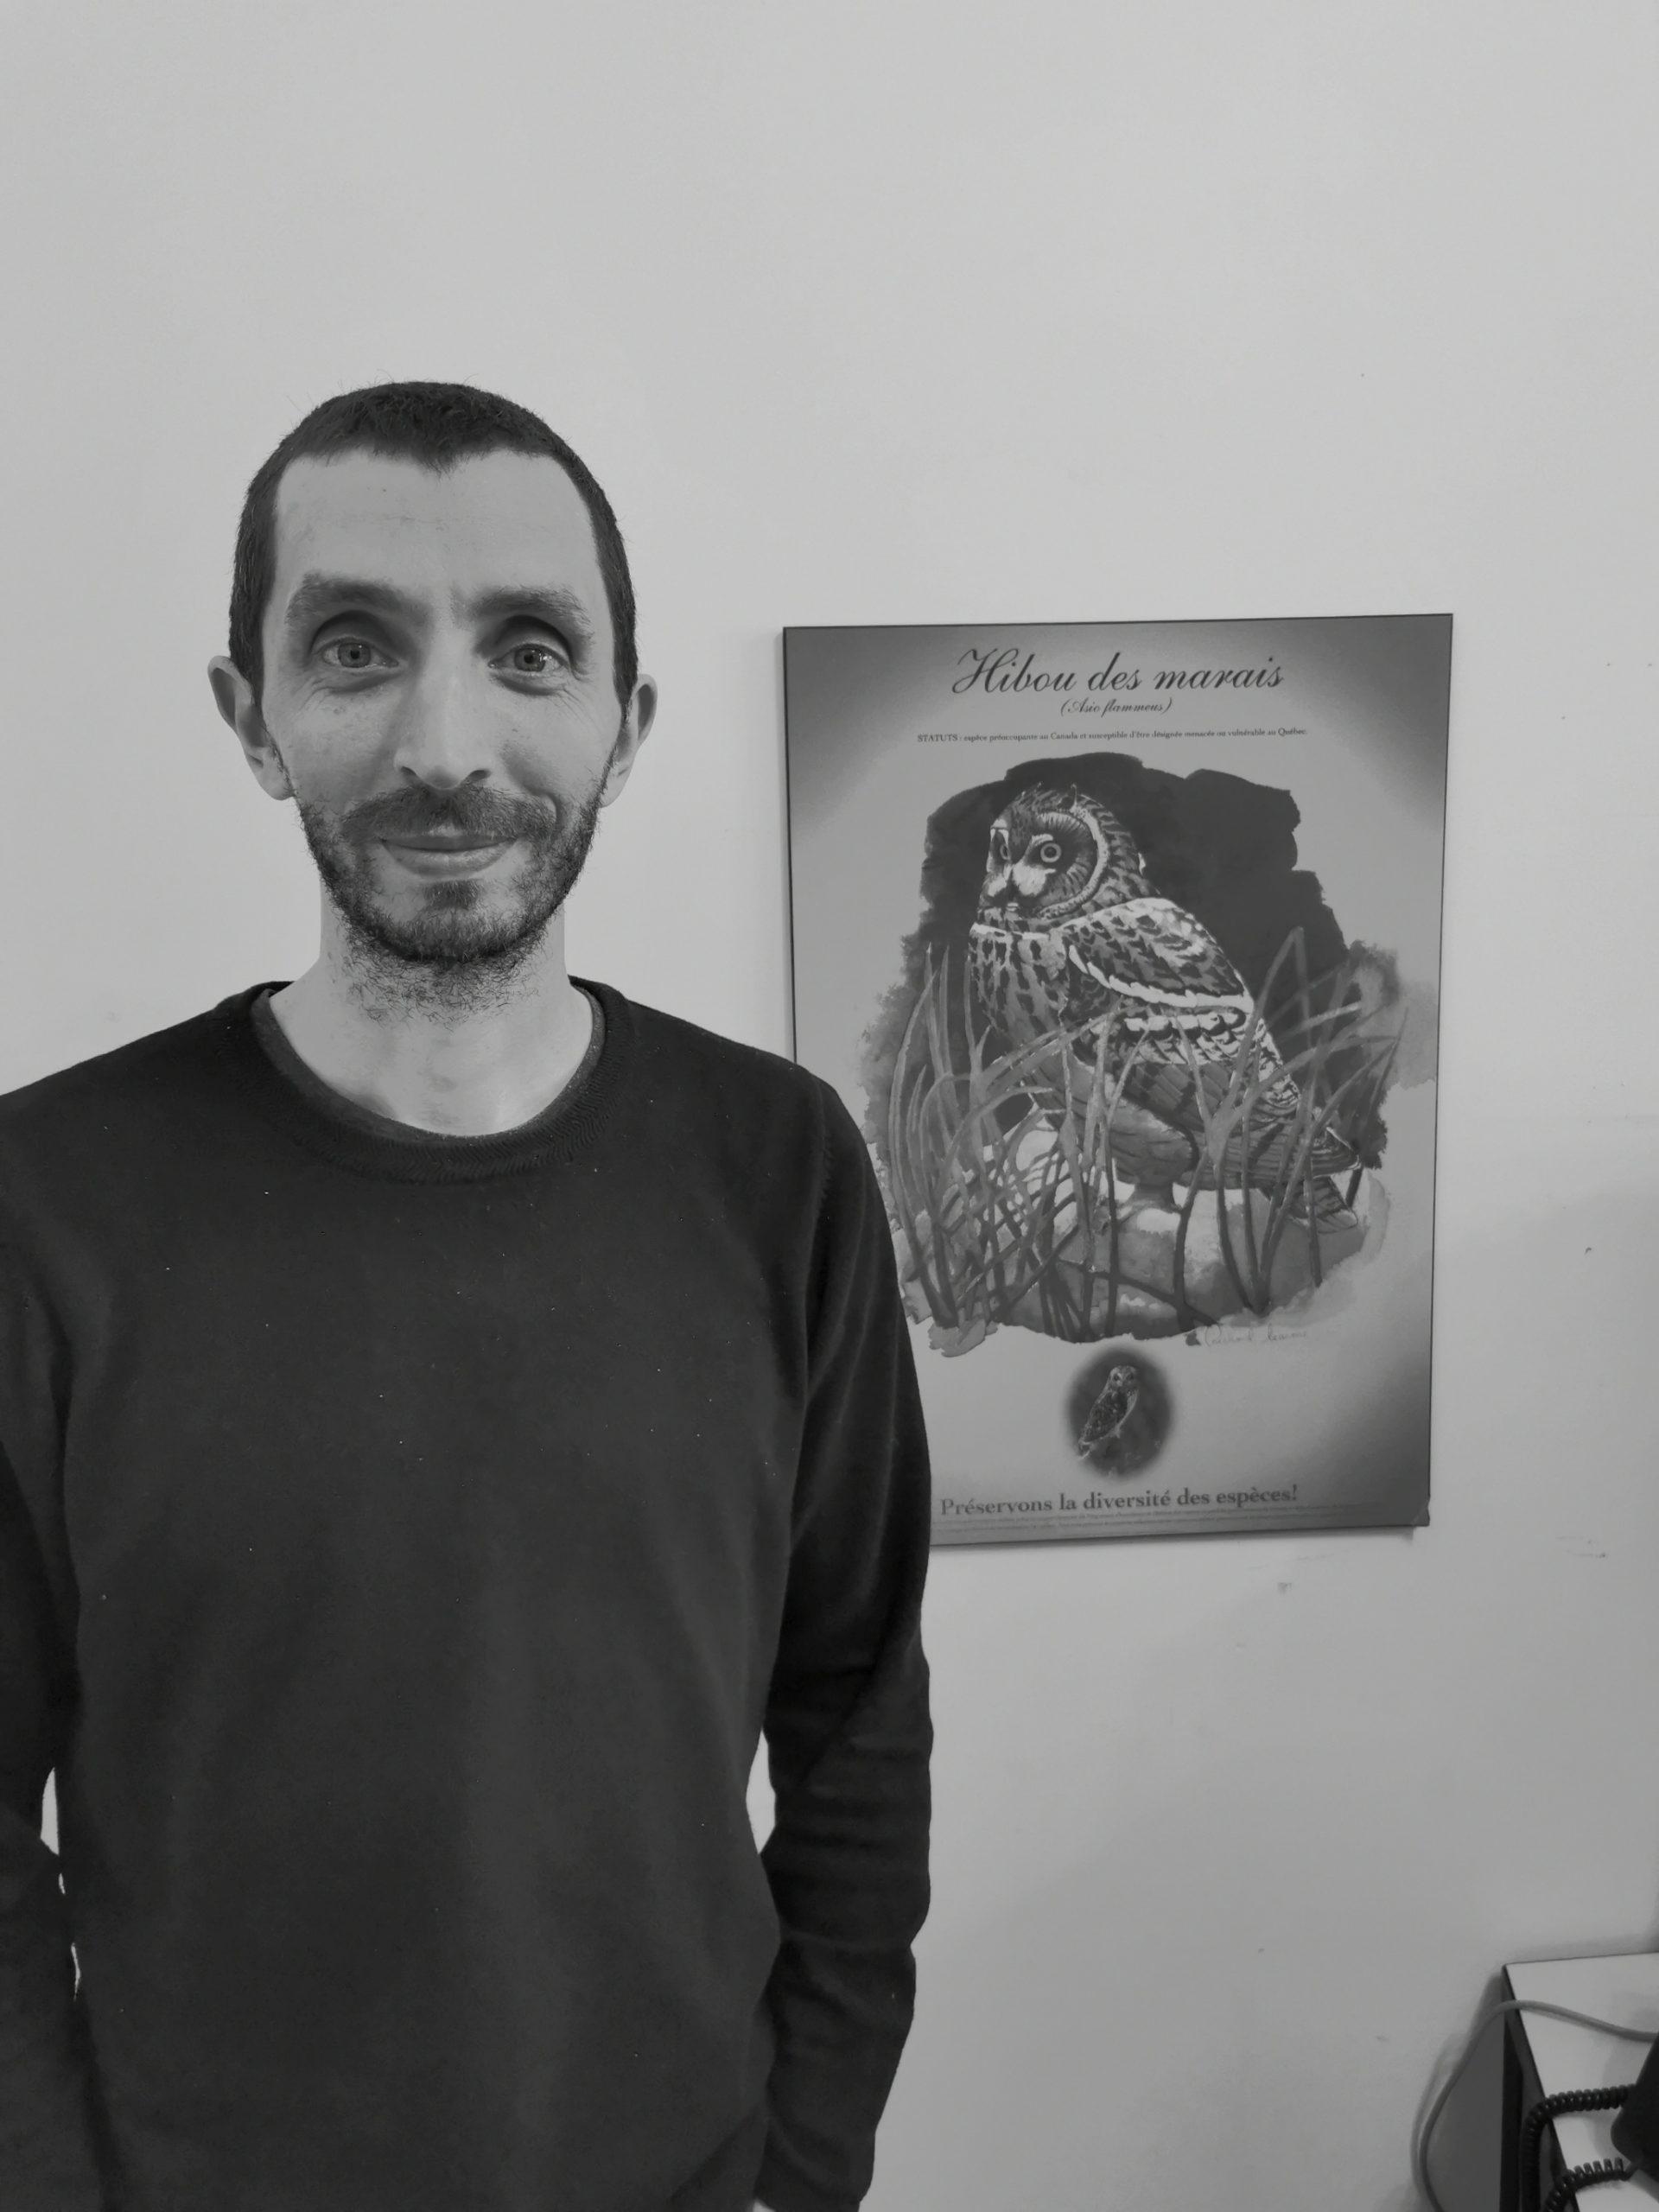 Alexandre Béland